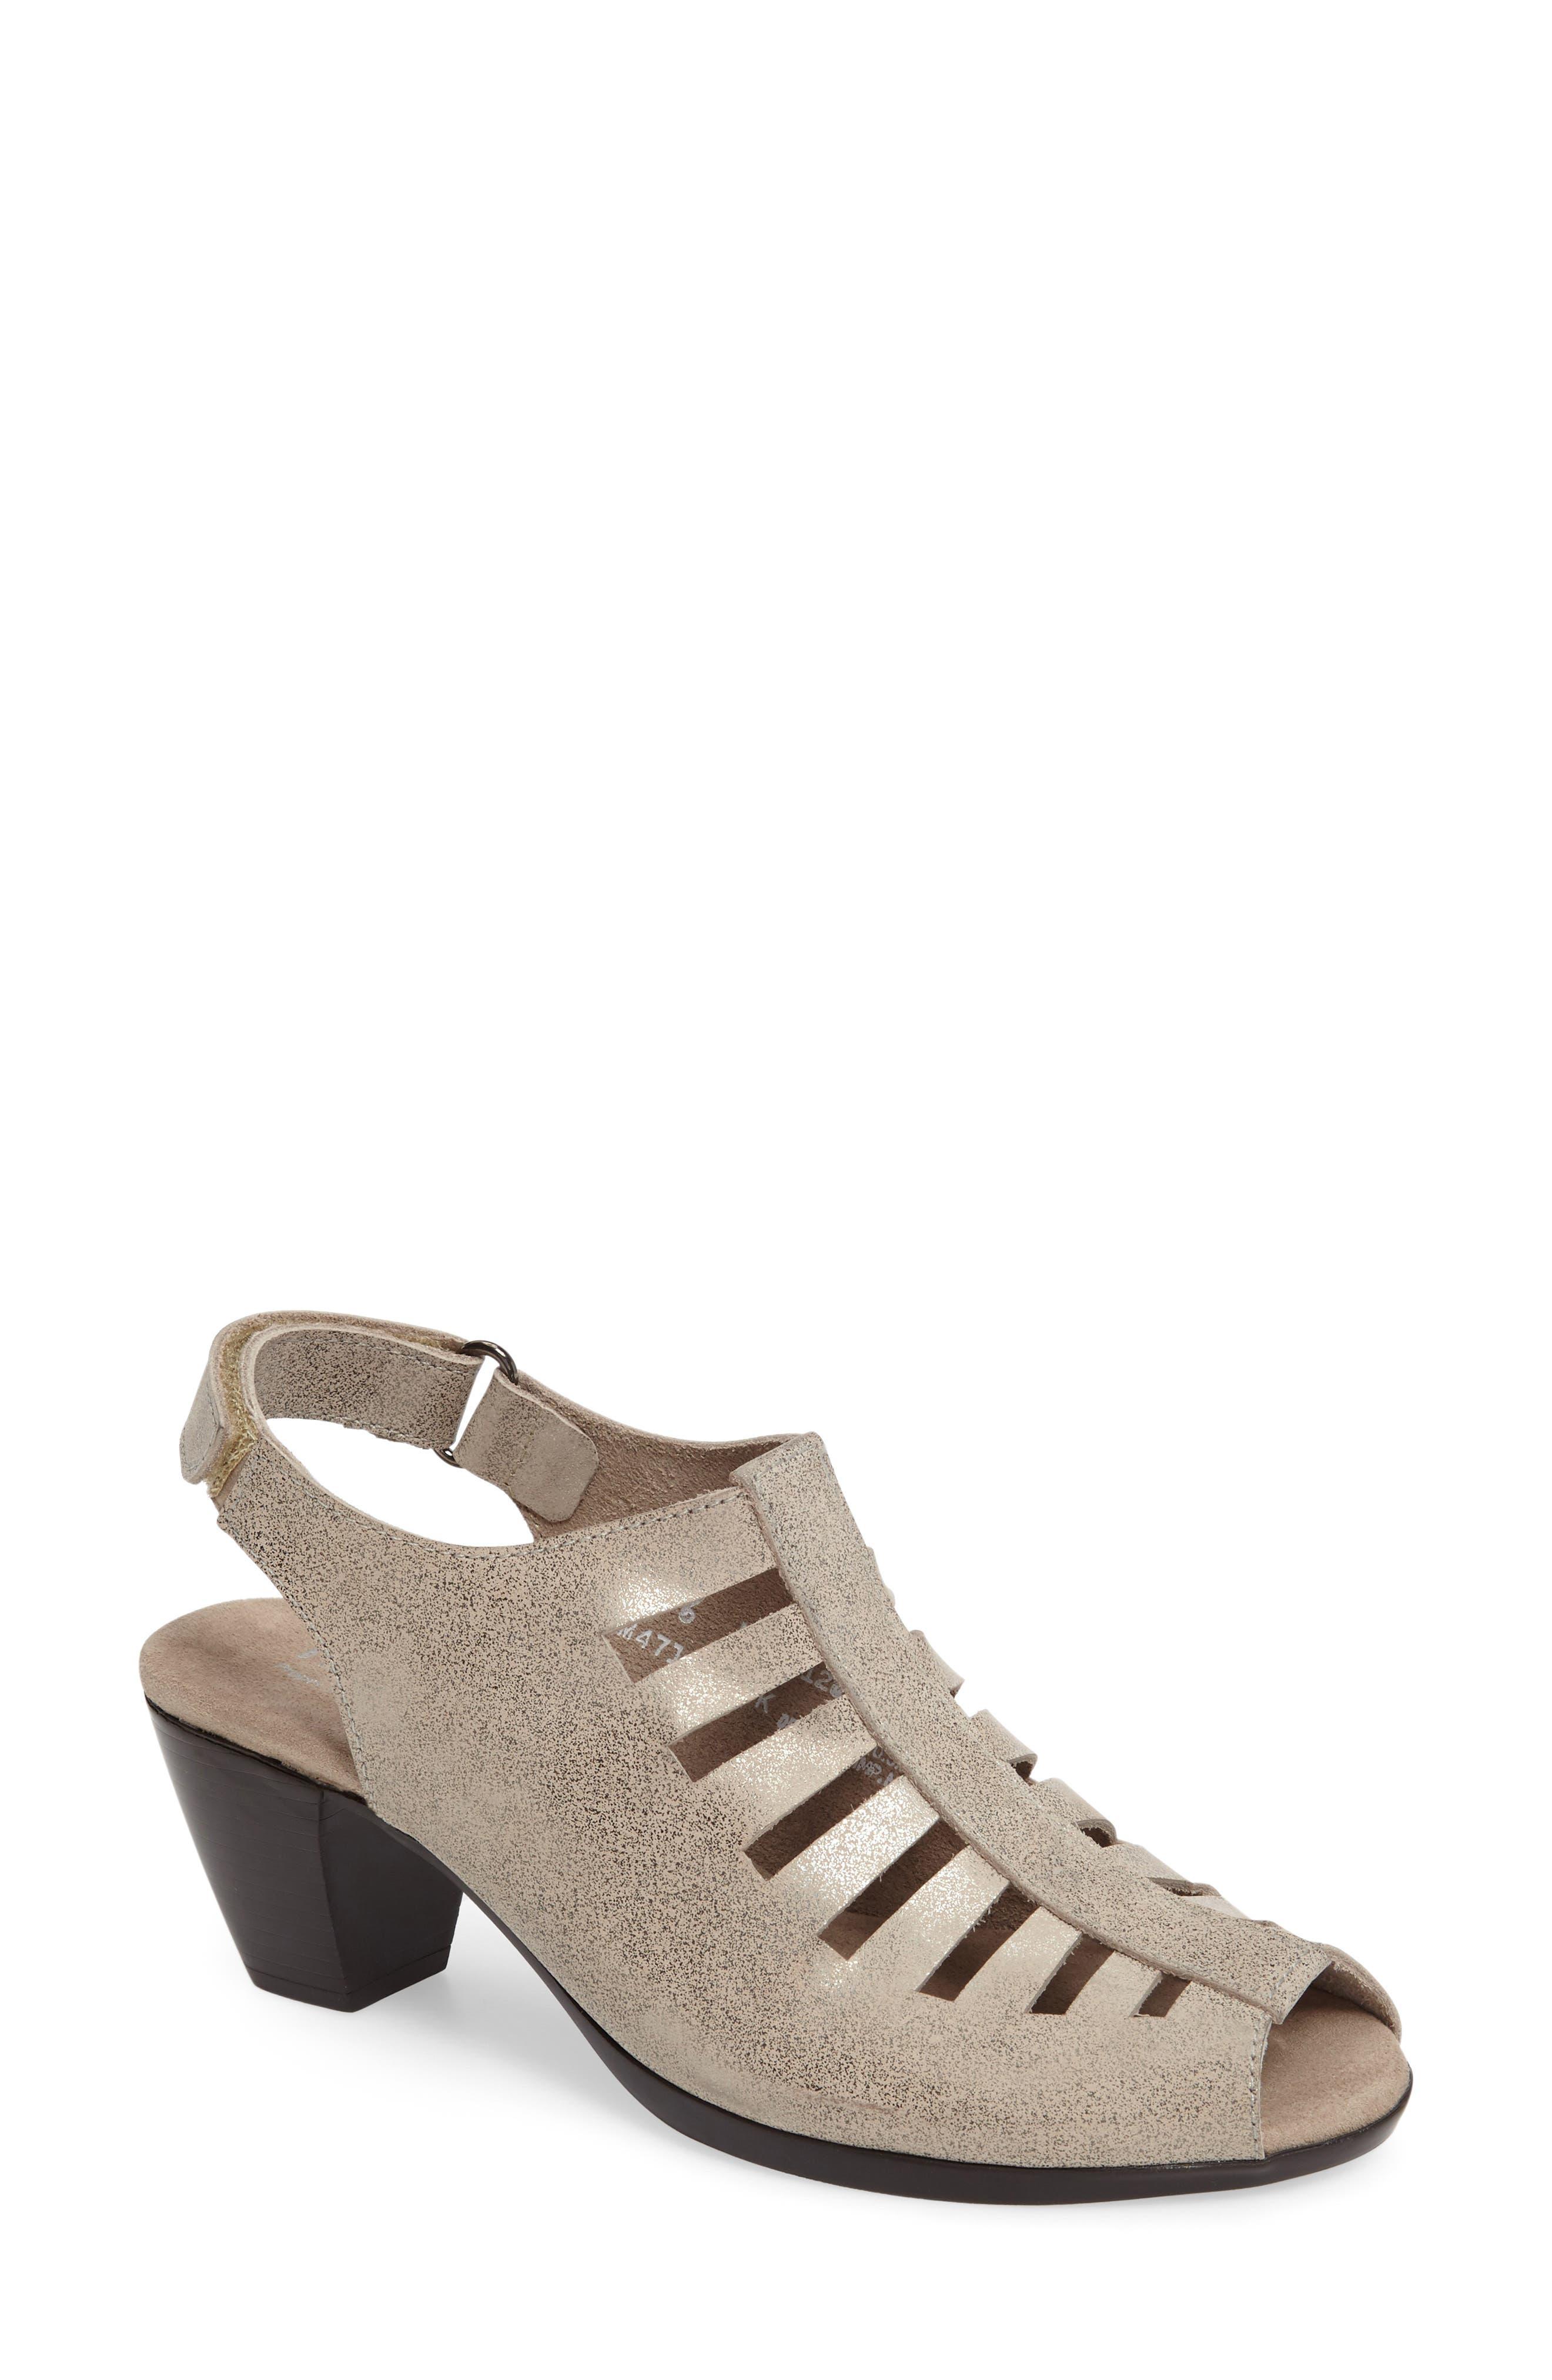 'Abby' Slingback Sandal,                             Main thumbnail 1, color,                             Silver Metallic